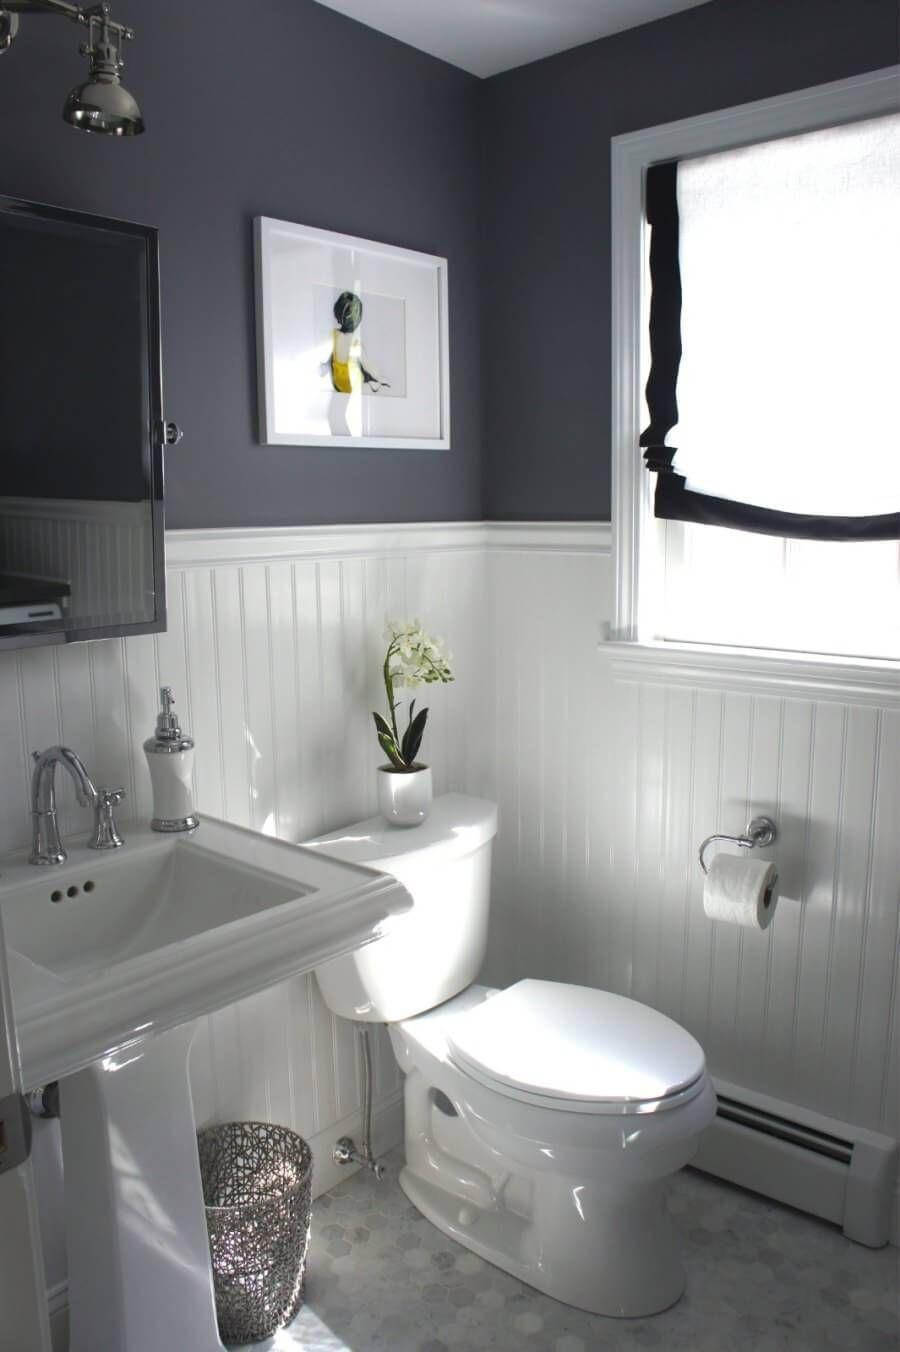 Bathroom Wainscoting Beadboard Panels In The Bathroom Design